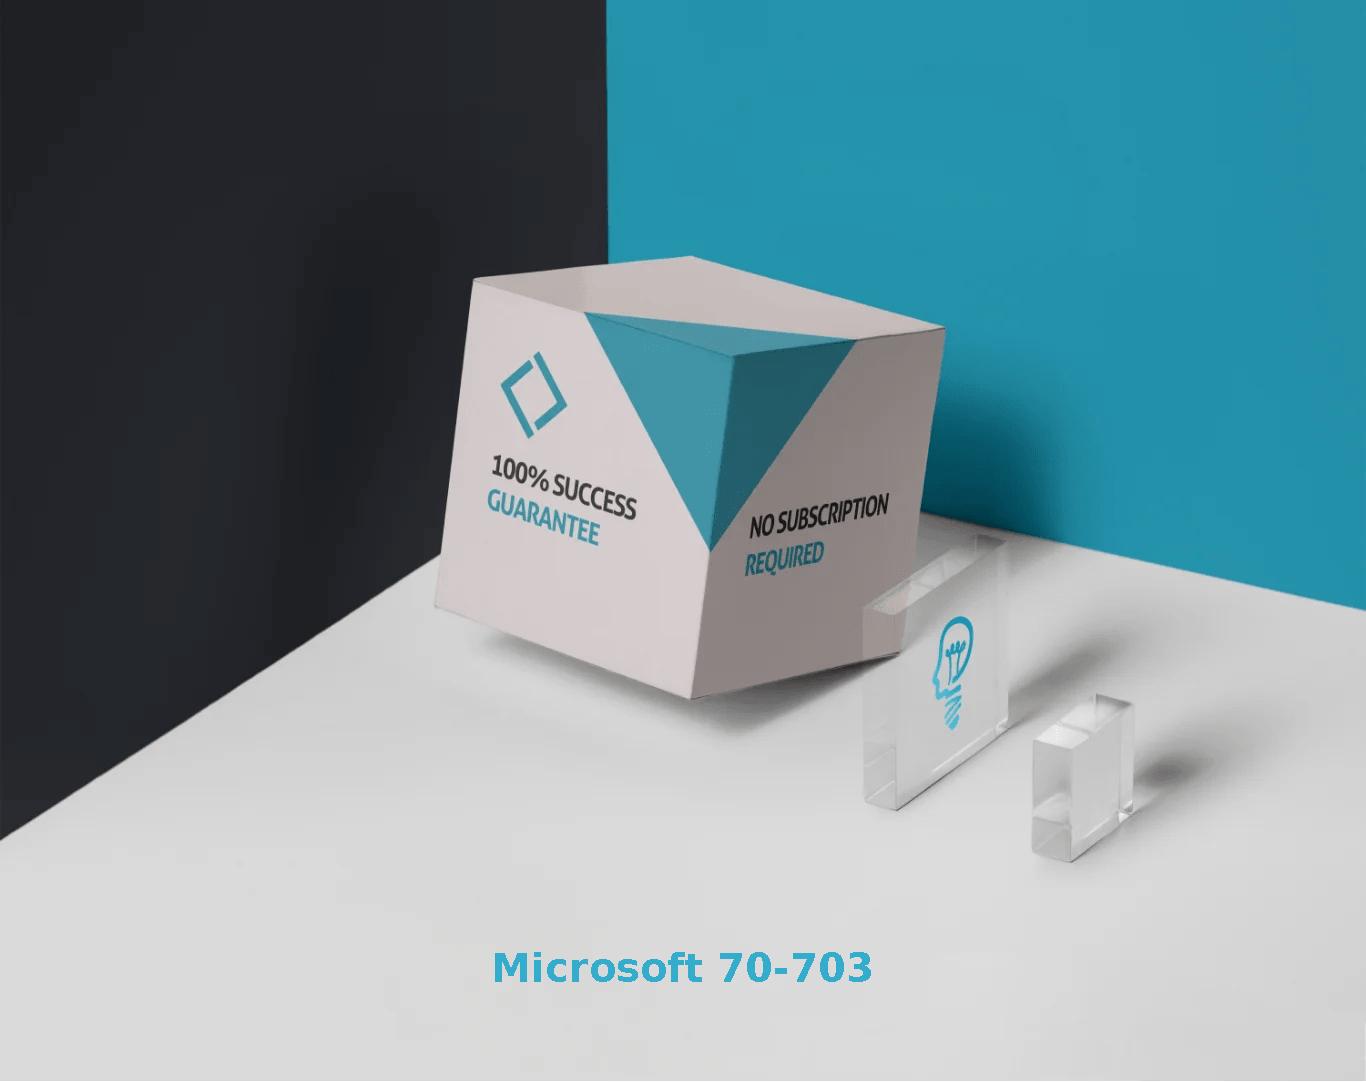 Microsoft 70-703 Exams